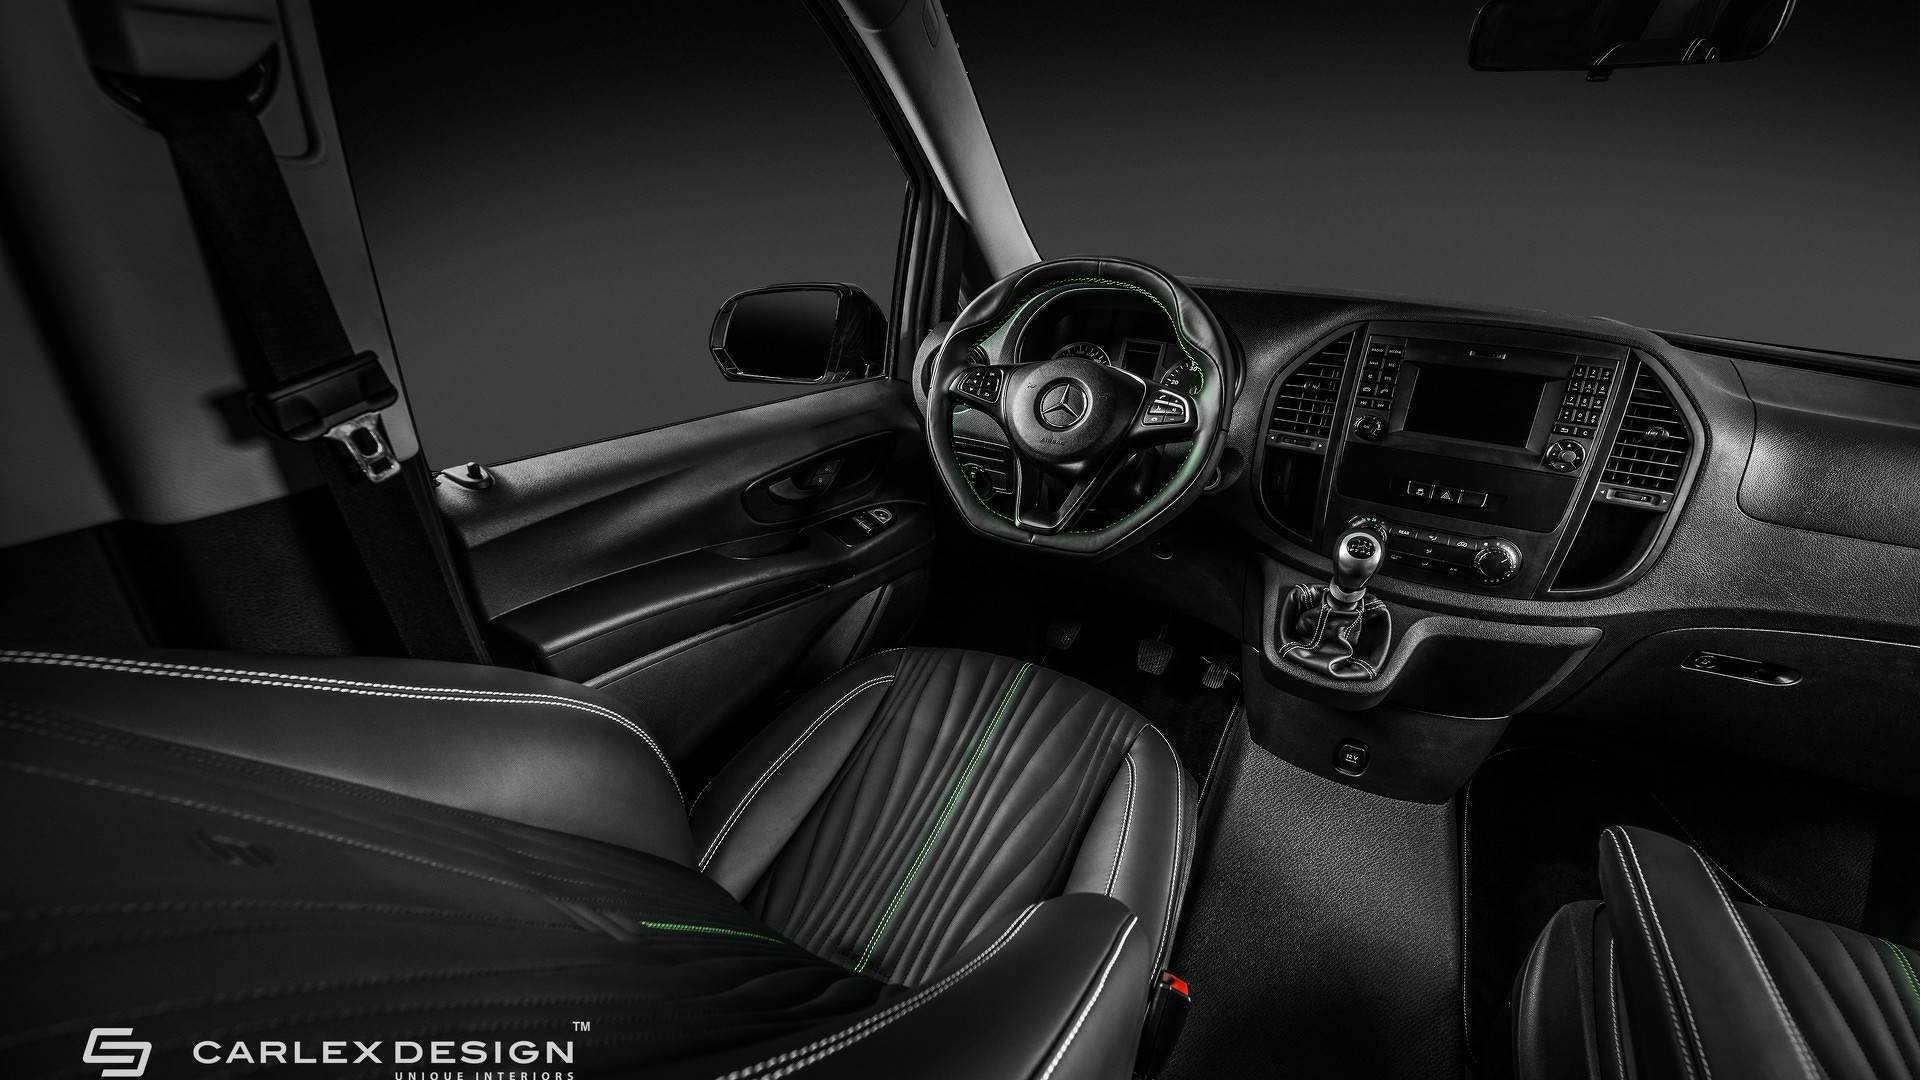 Mercedes Vito by Carlex Design